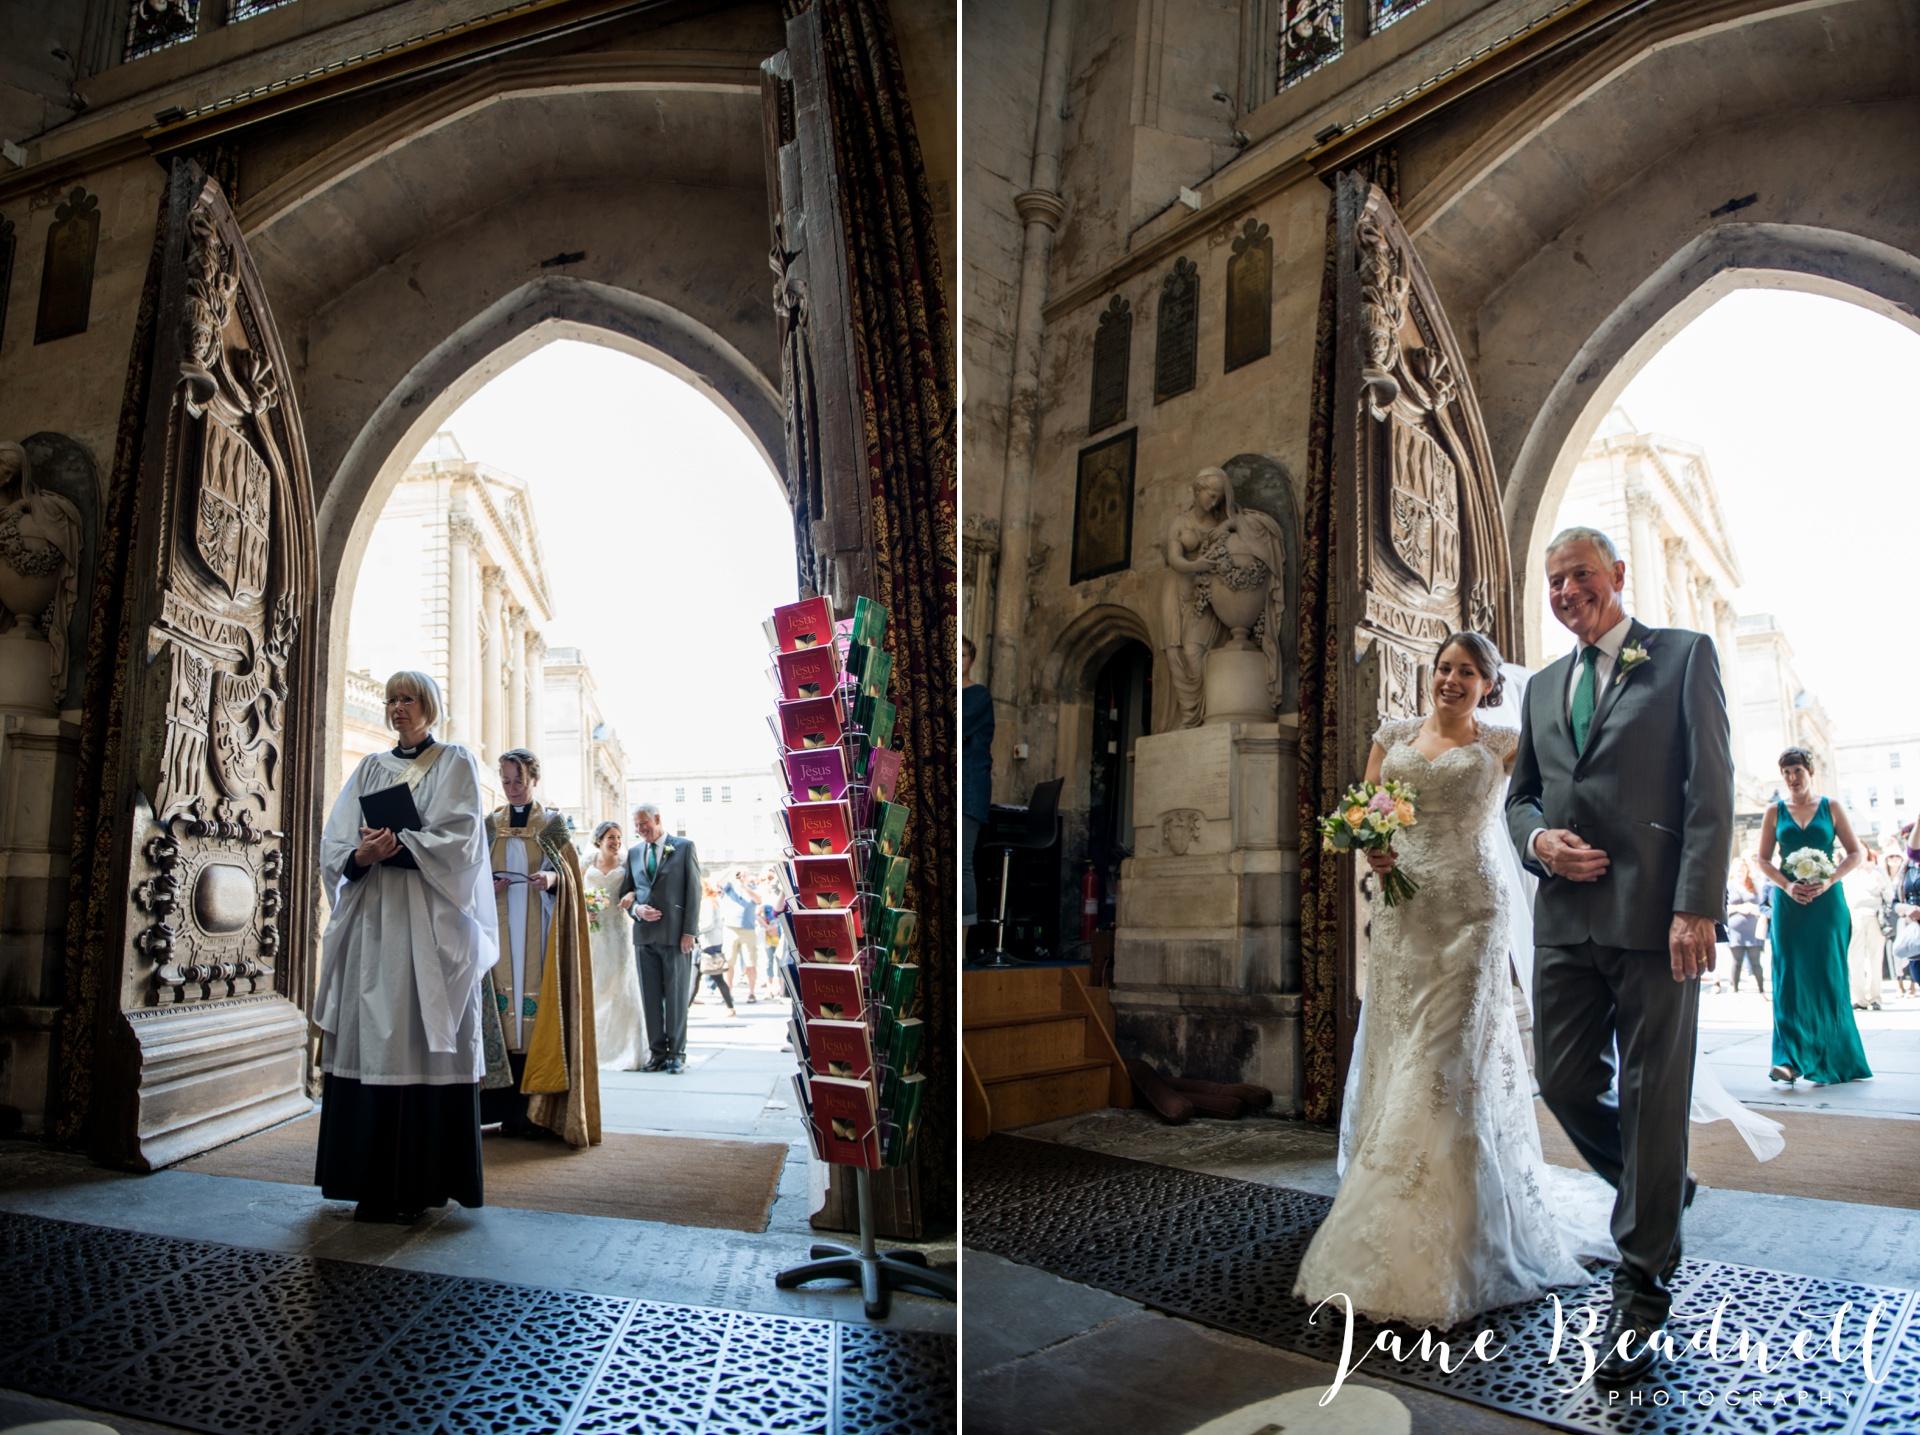 Bath Abbey wedding photography by fine art wedding photographer Leeds Jane Beadnell_6